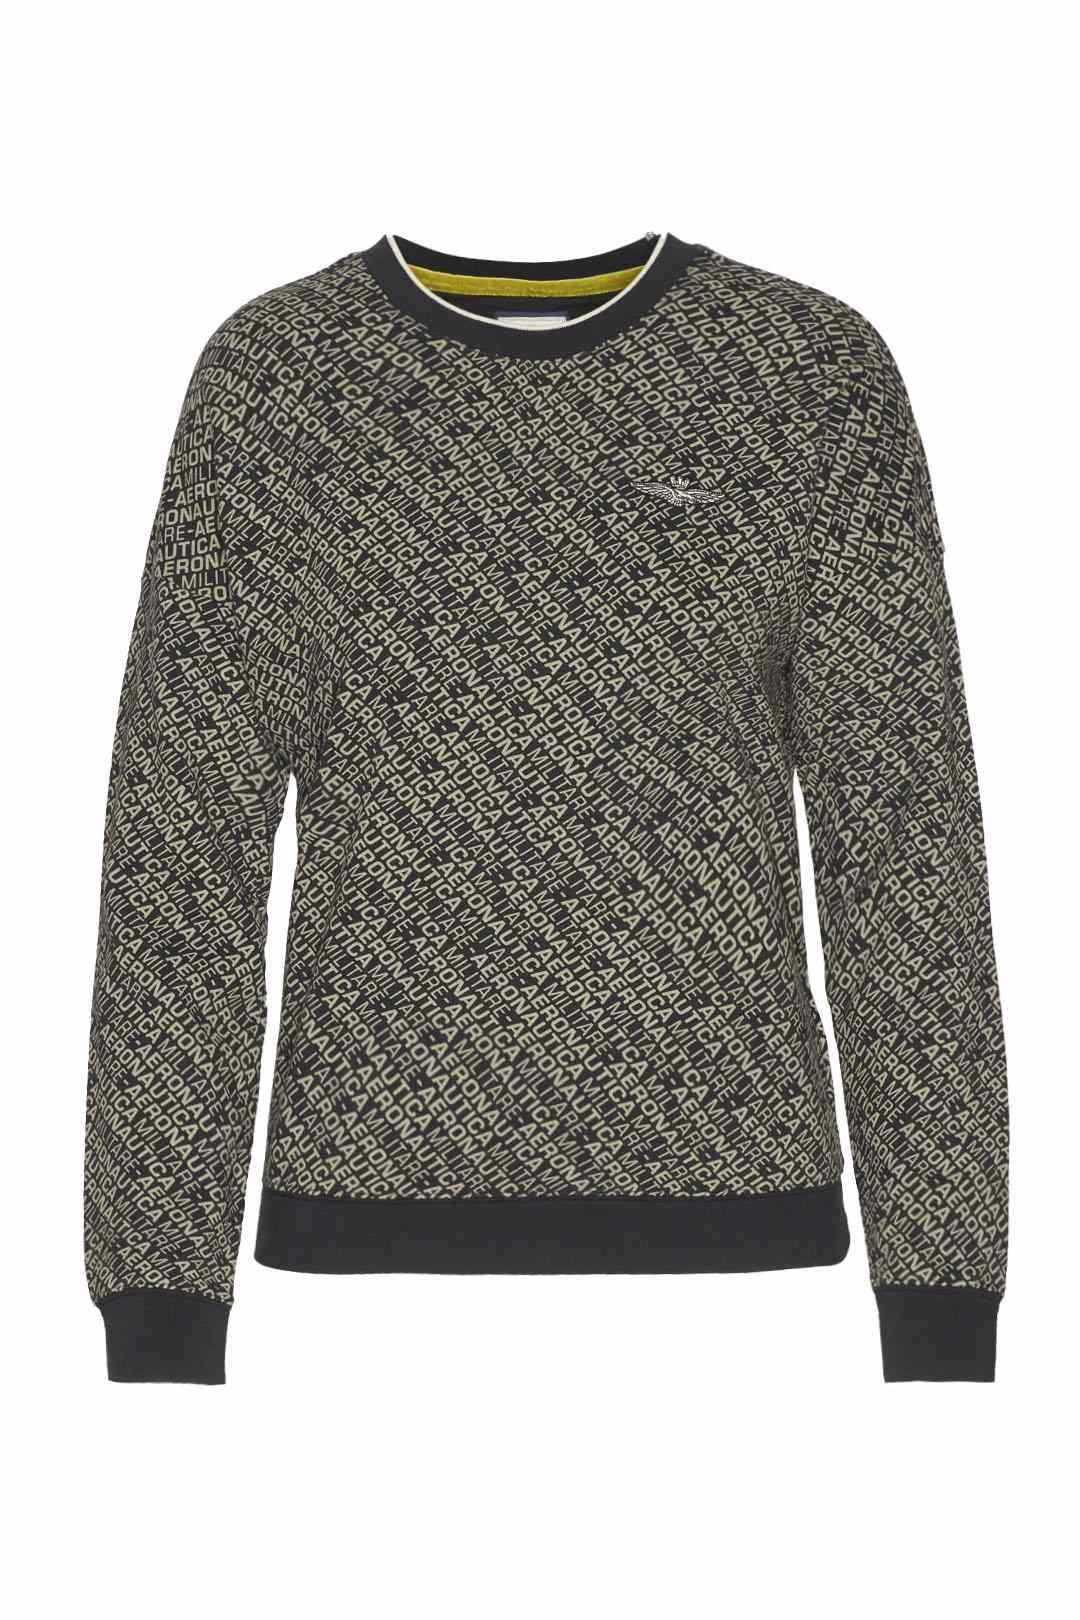 Crew neck sweatshirt with all-over print 1